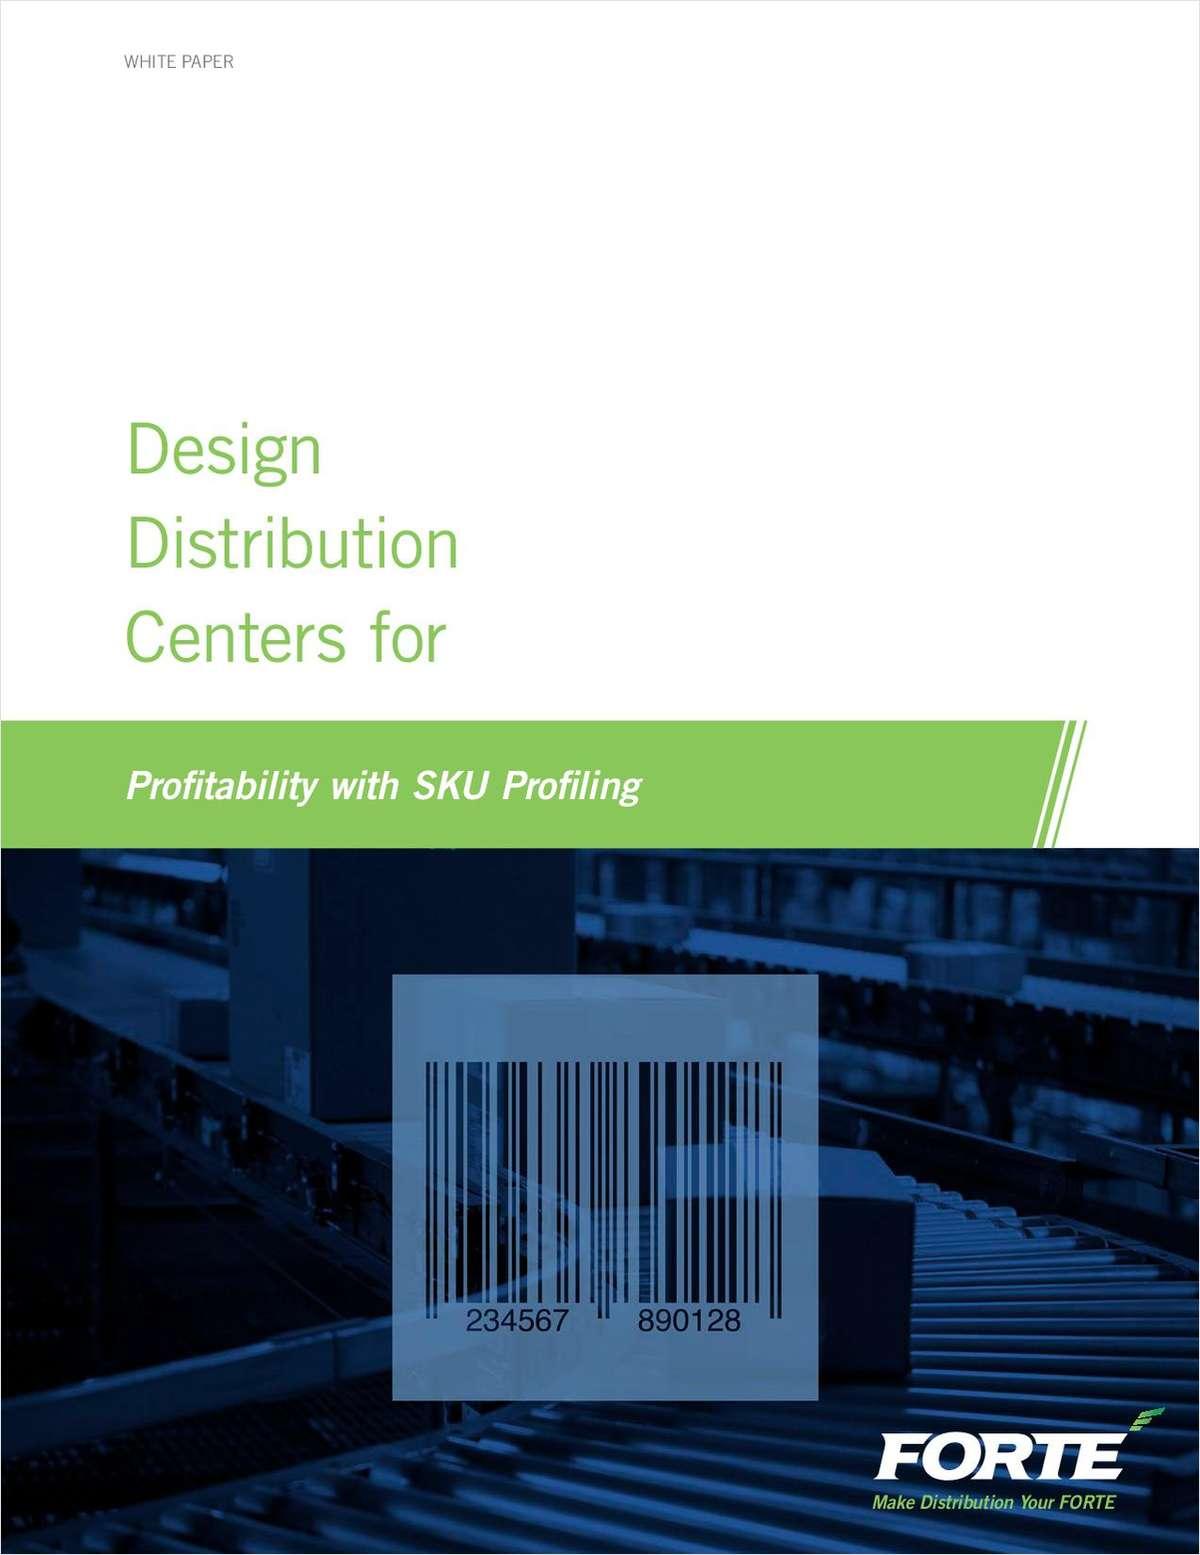 Design Distribution Centers for Profitability with SKU profiling